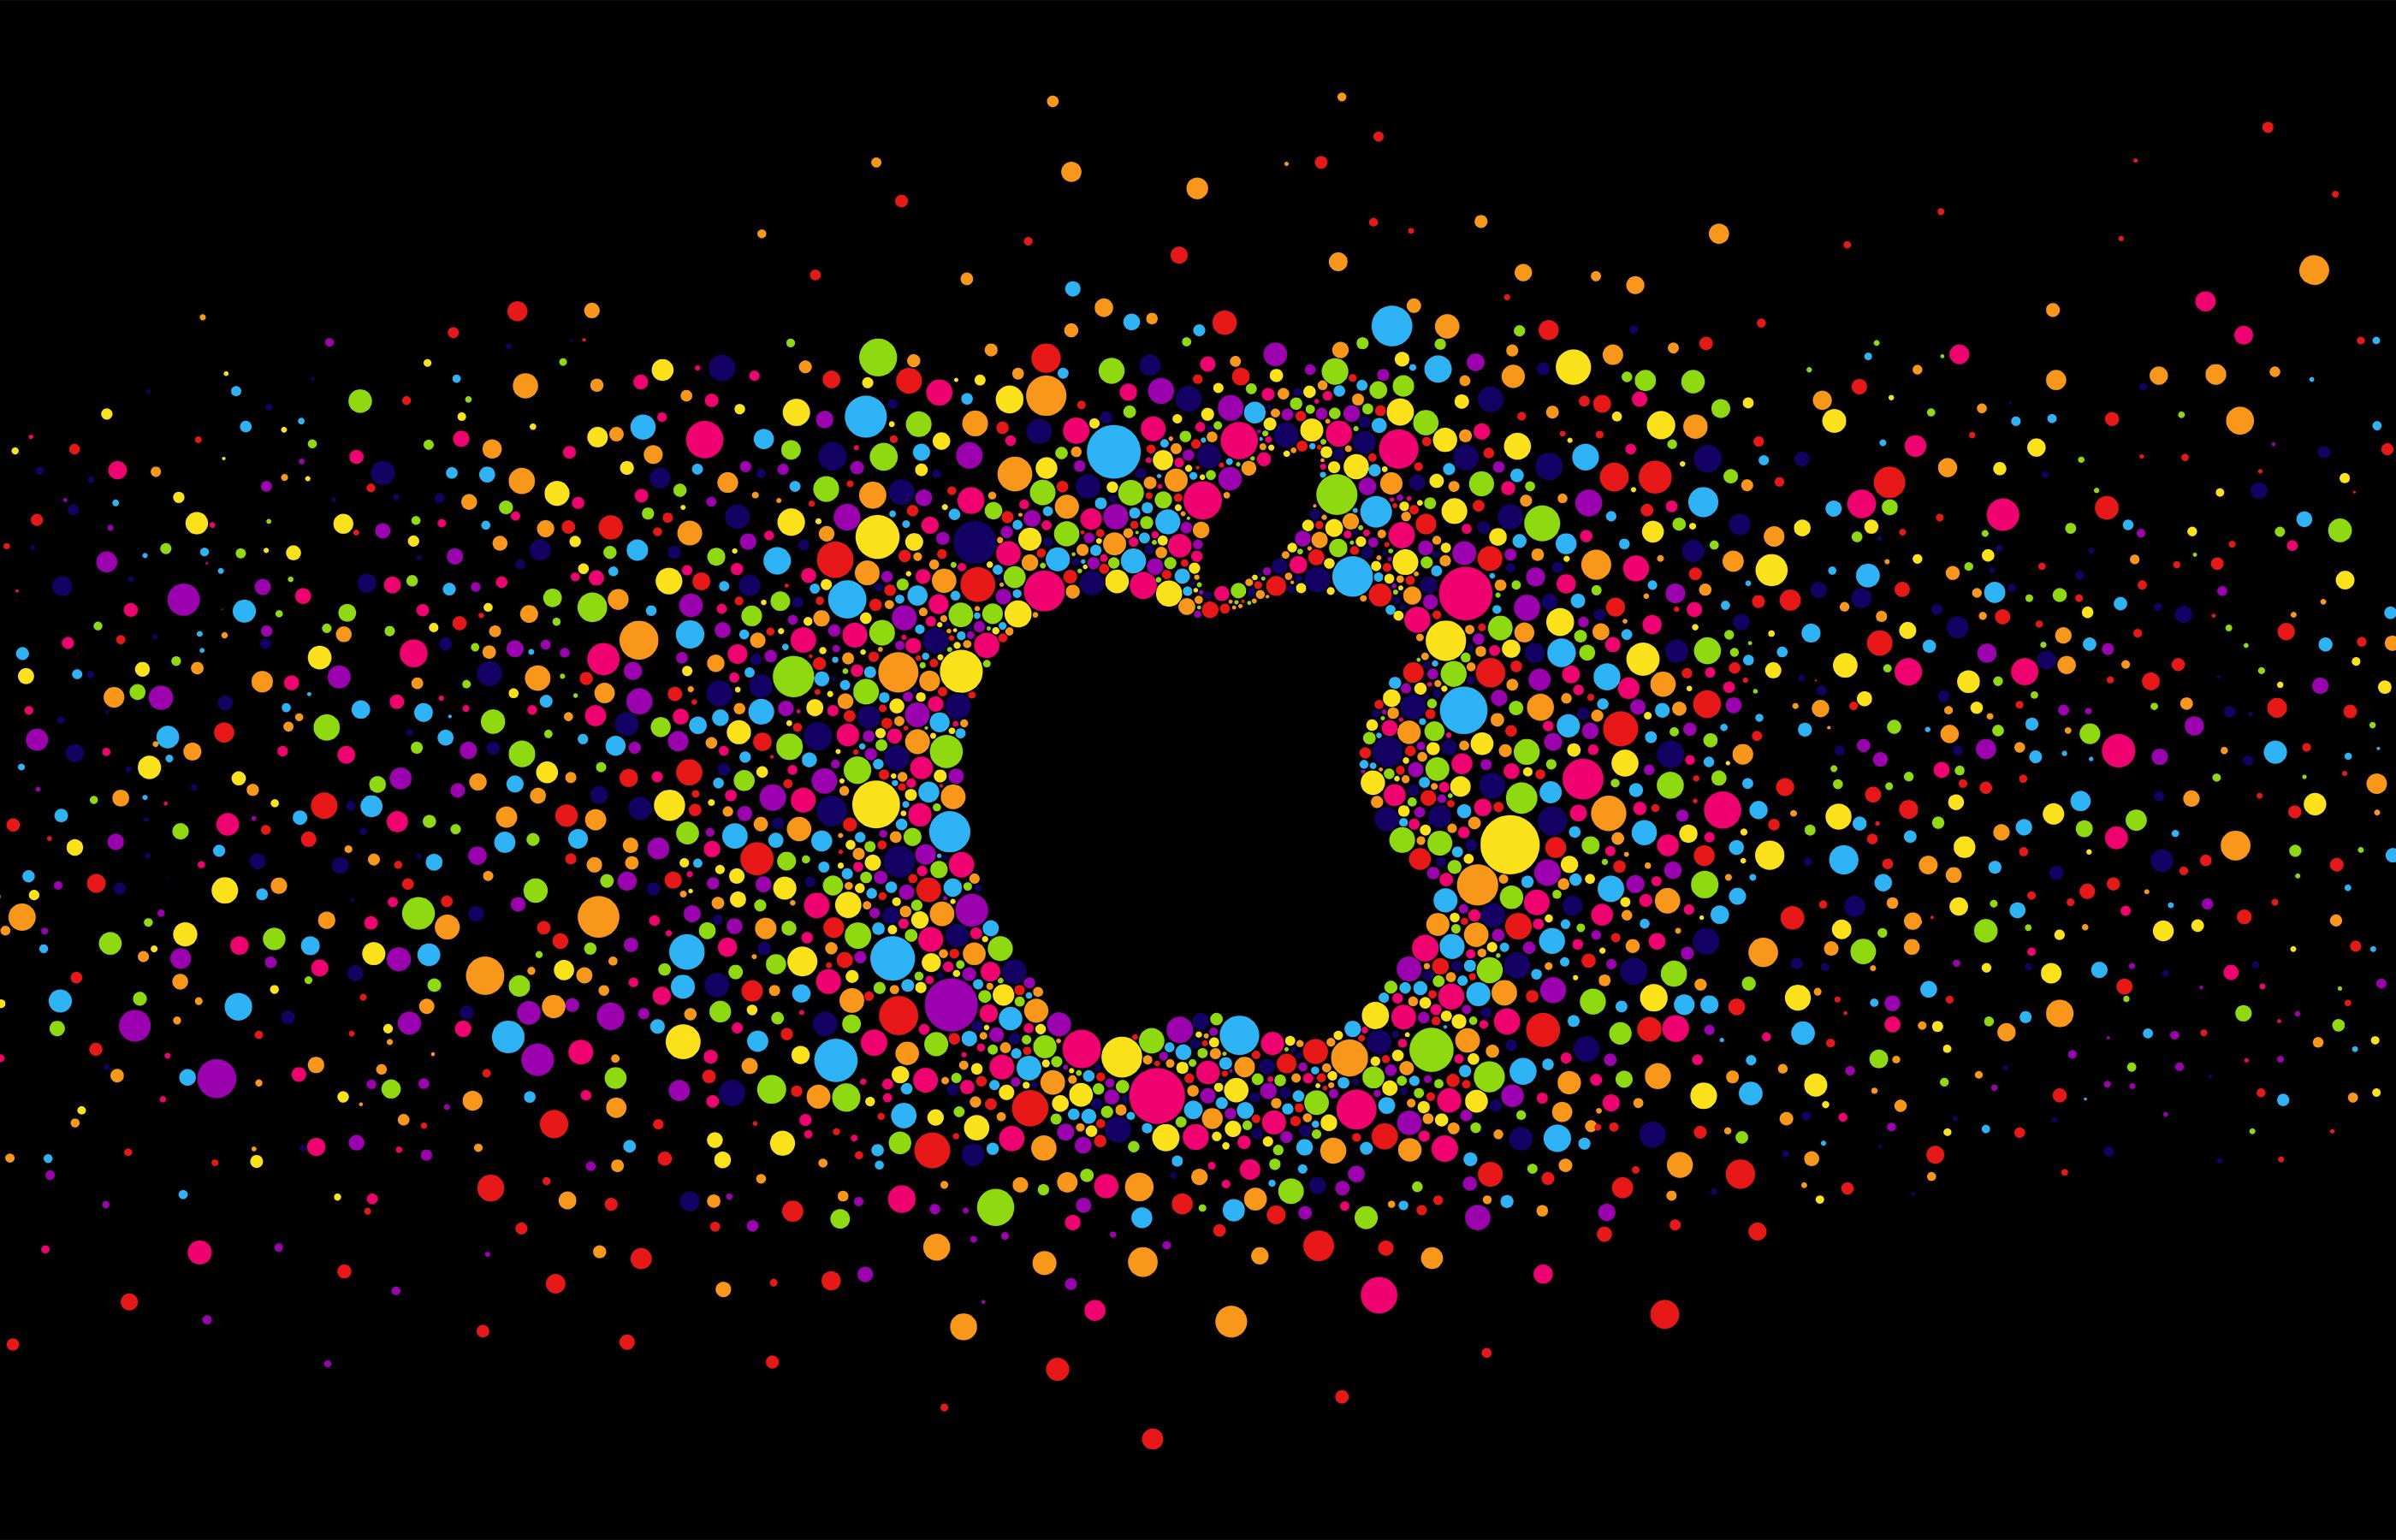 45 5k Image Hd Wallpaper Apple On Wallpapersafari